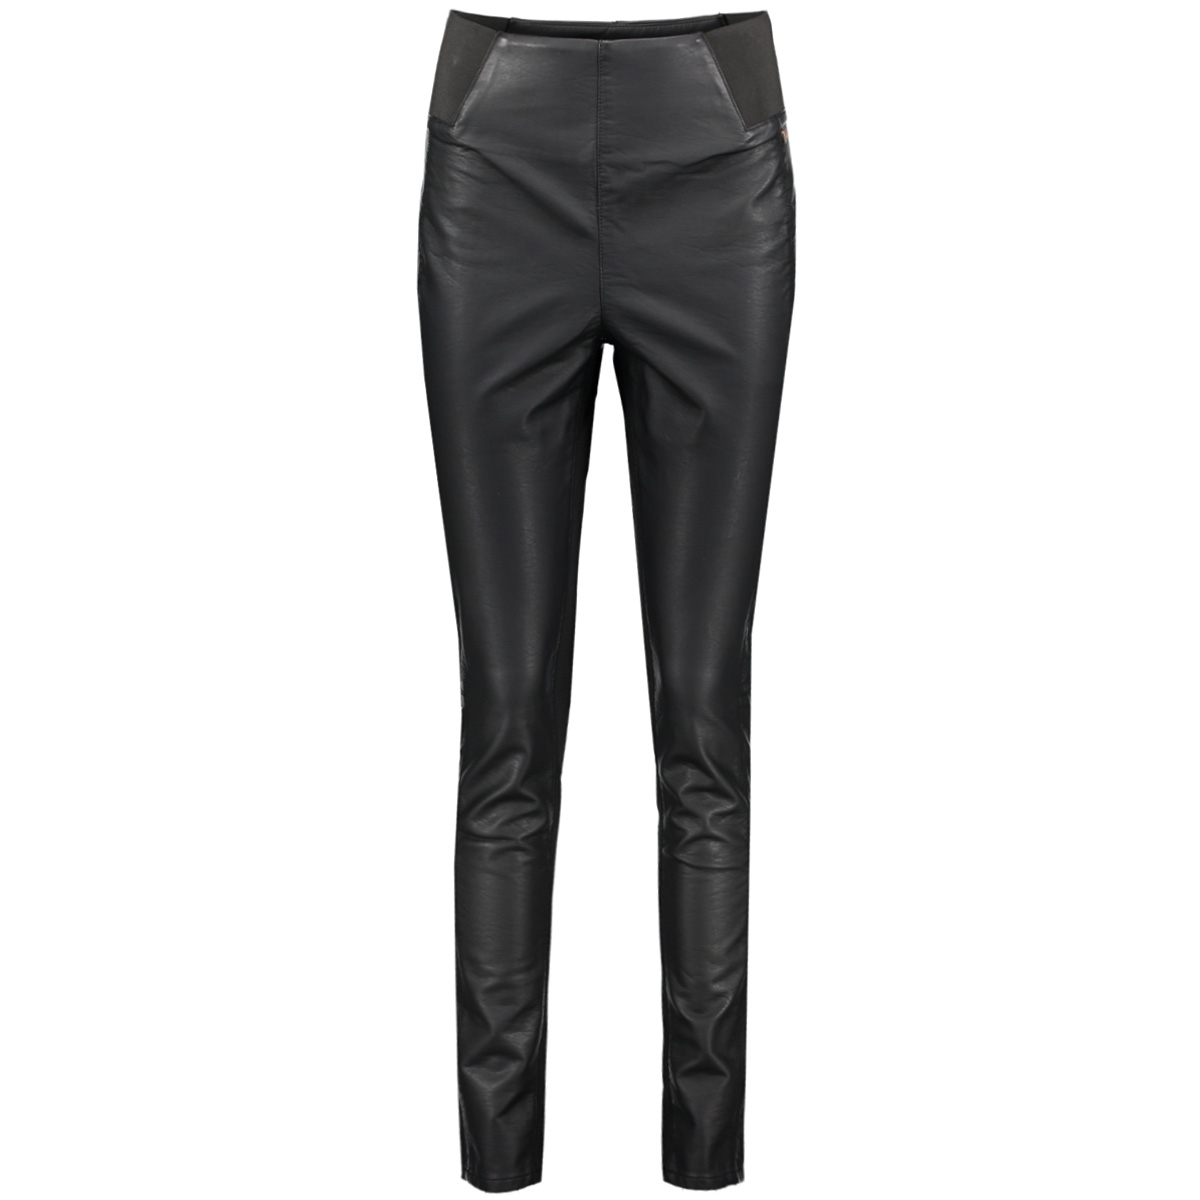 h70312 garcia legging 60 black